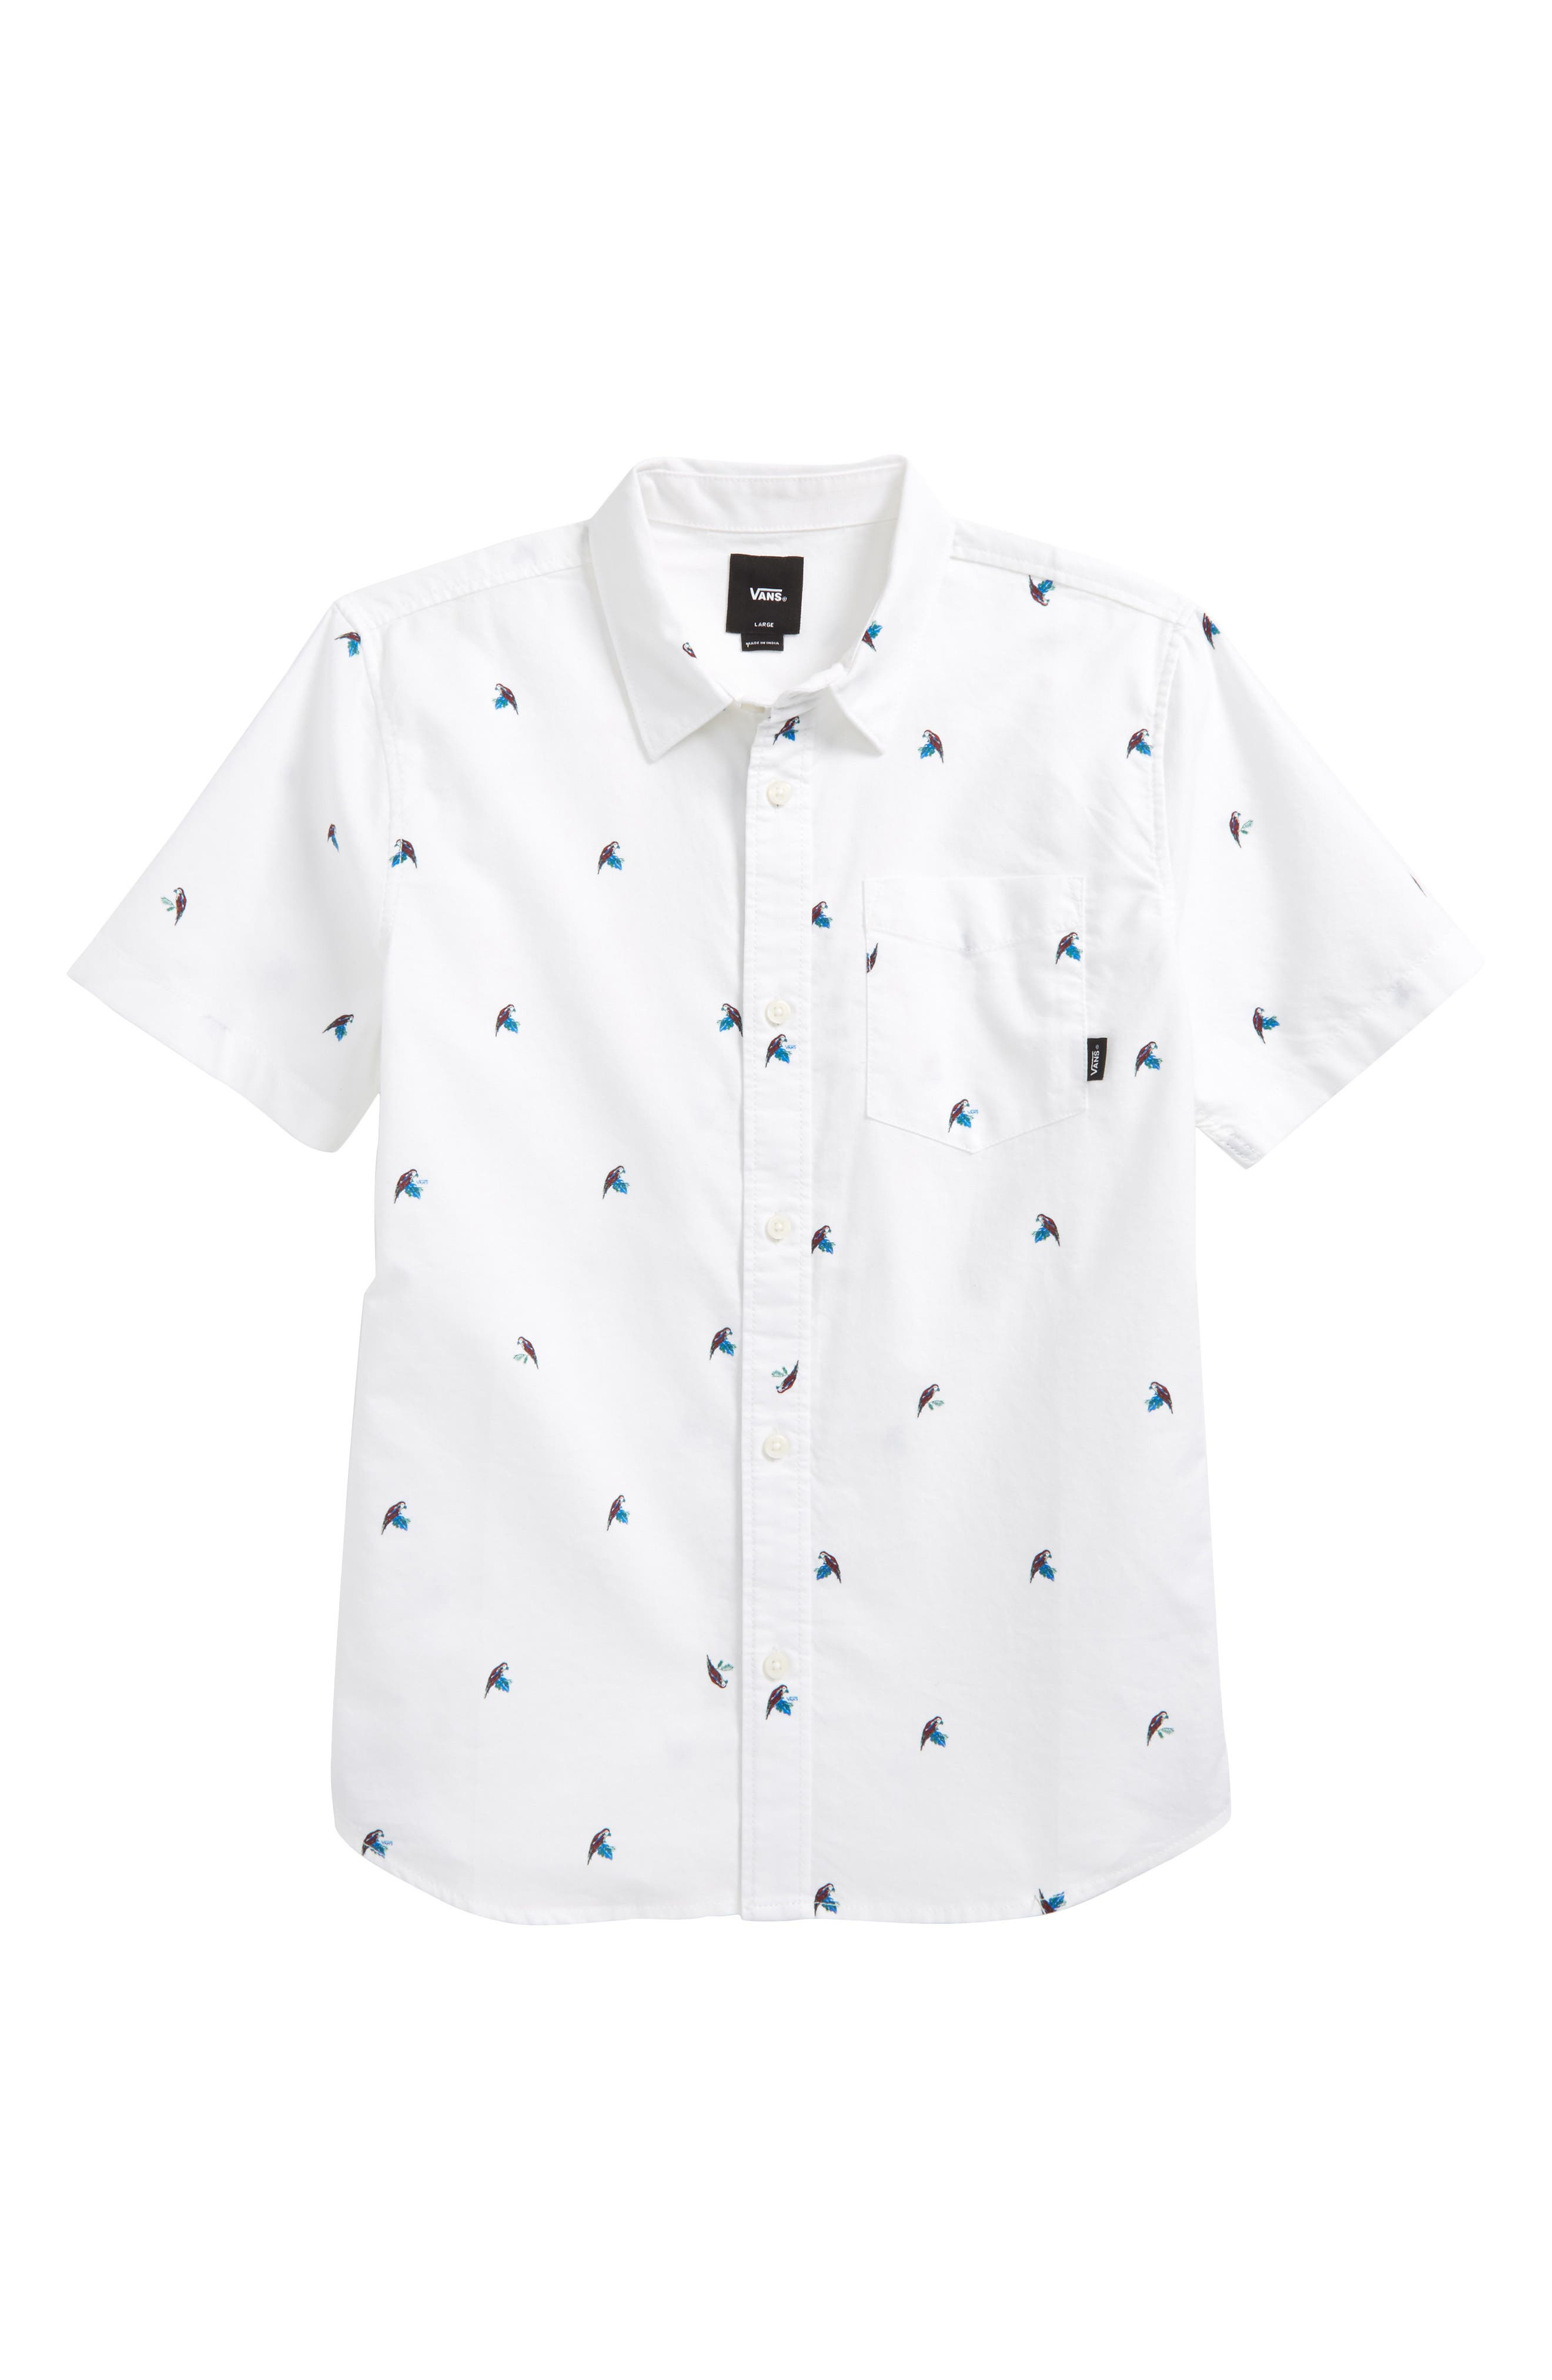 Main Image - Vans Houser Woven Shirt (Big Boys)